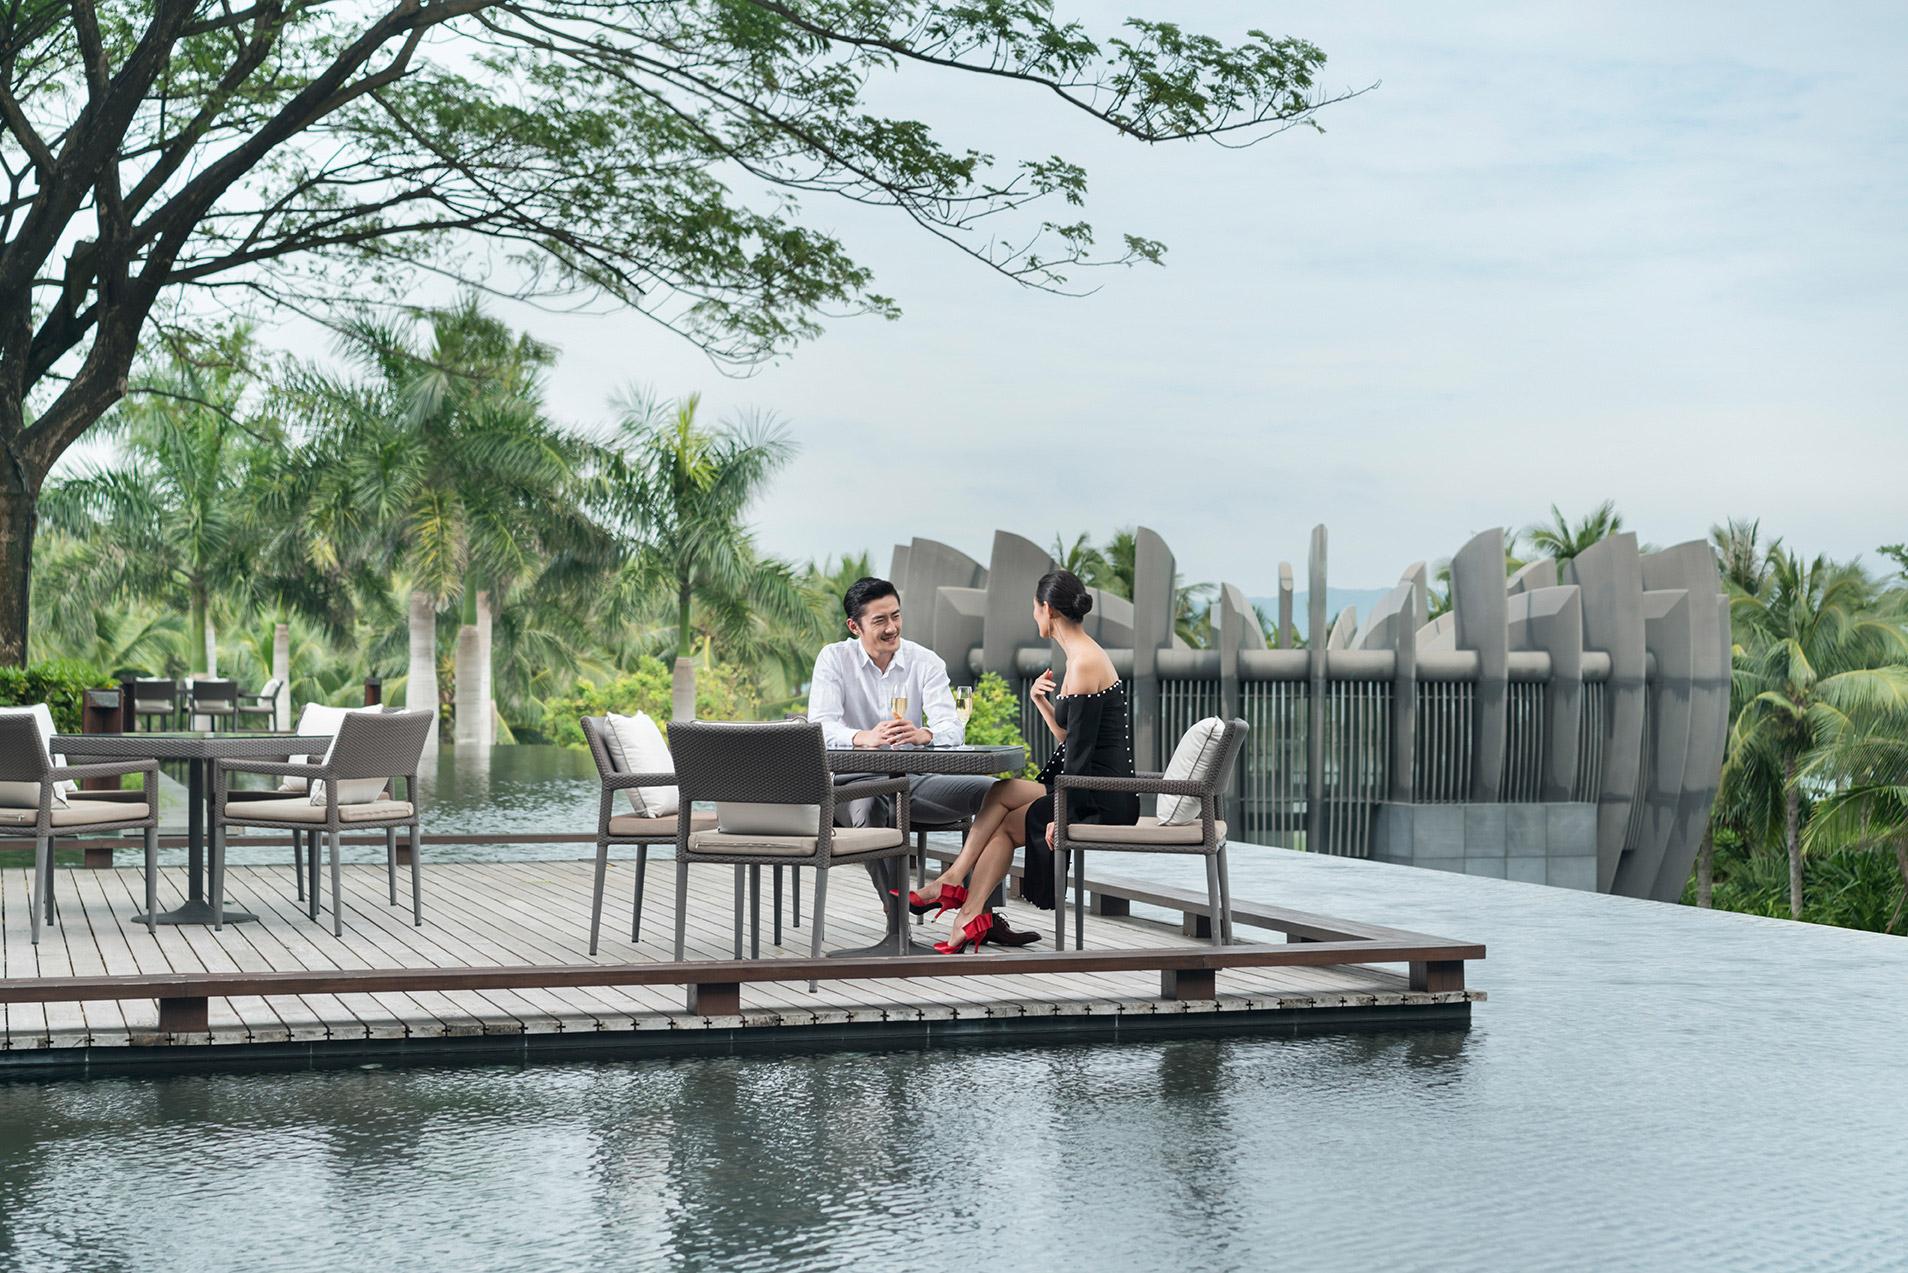 Romantic Moments - Terrace浪漫时刻 - 观景台 三亚太阳湾柏悦酒店.jpg